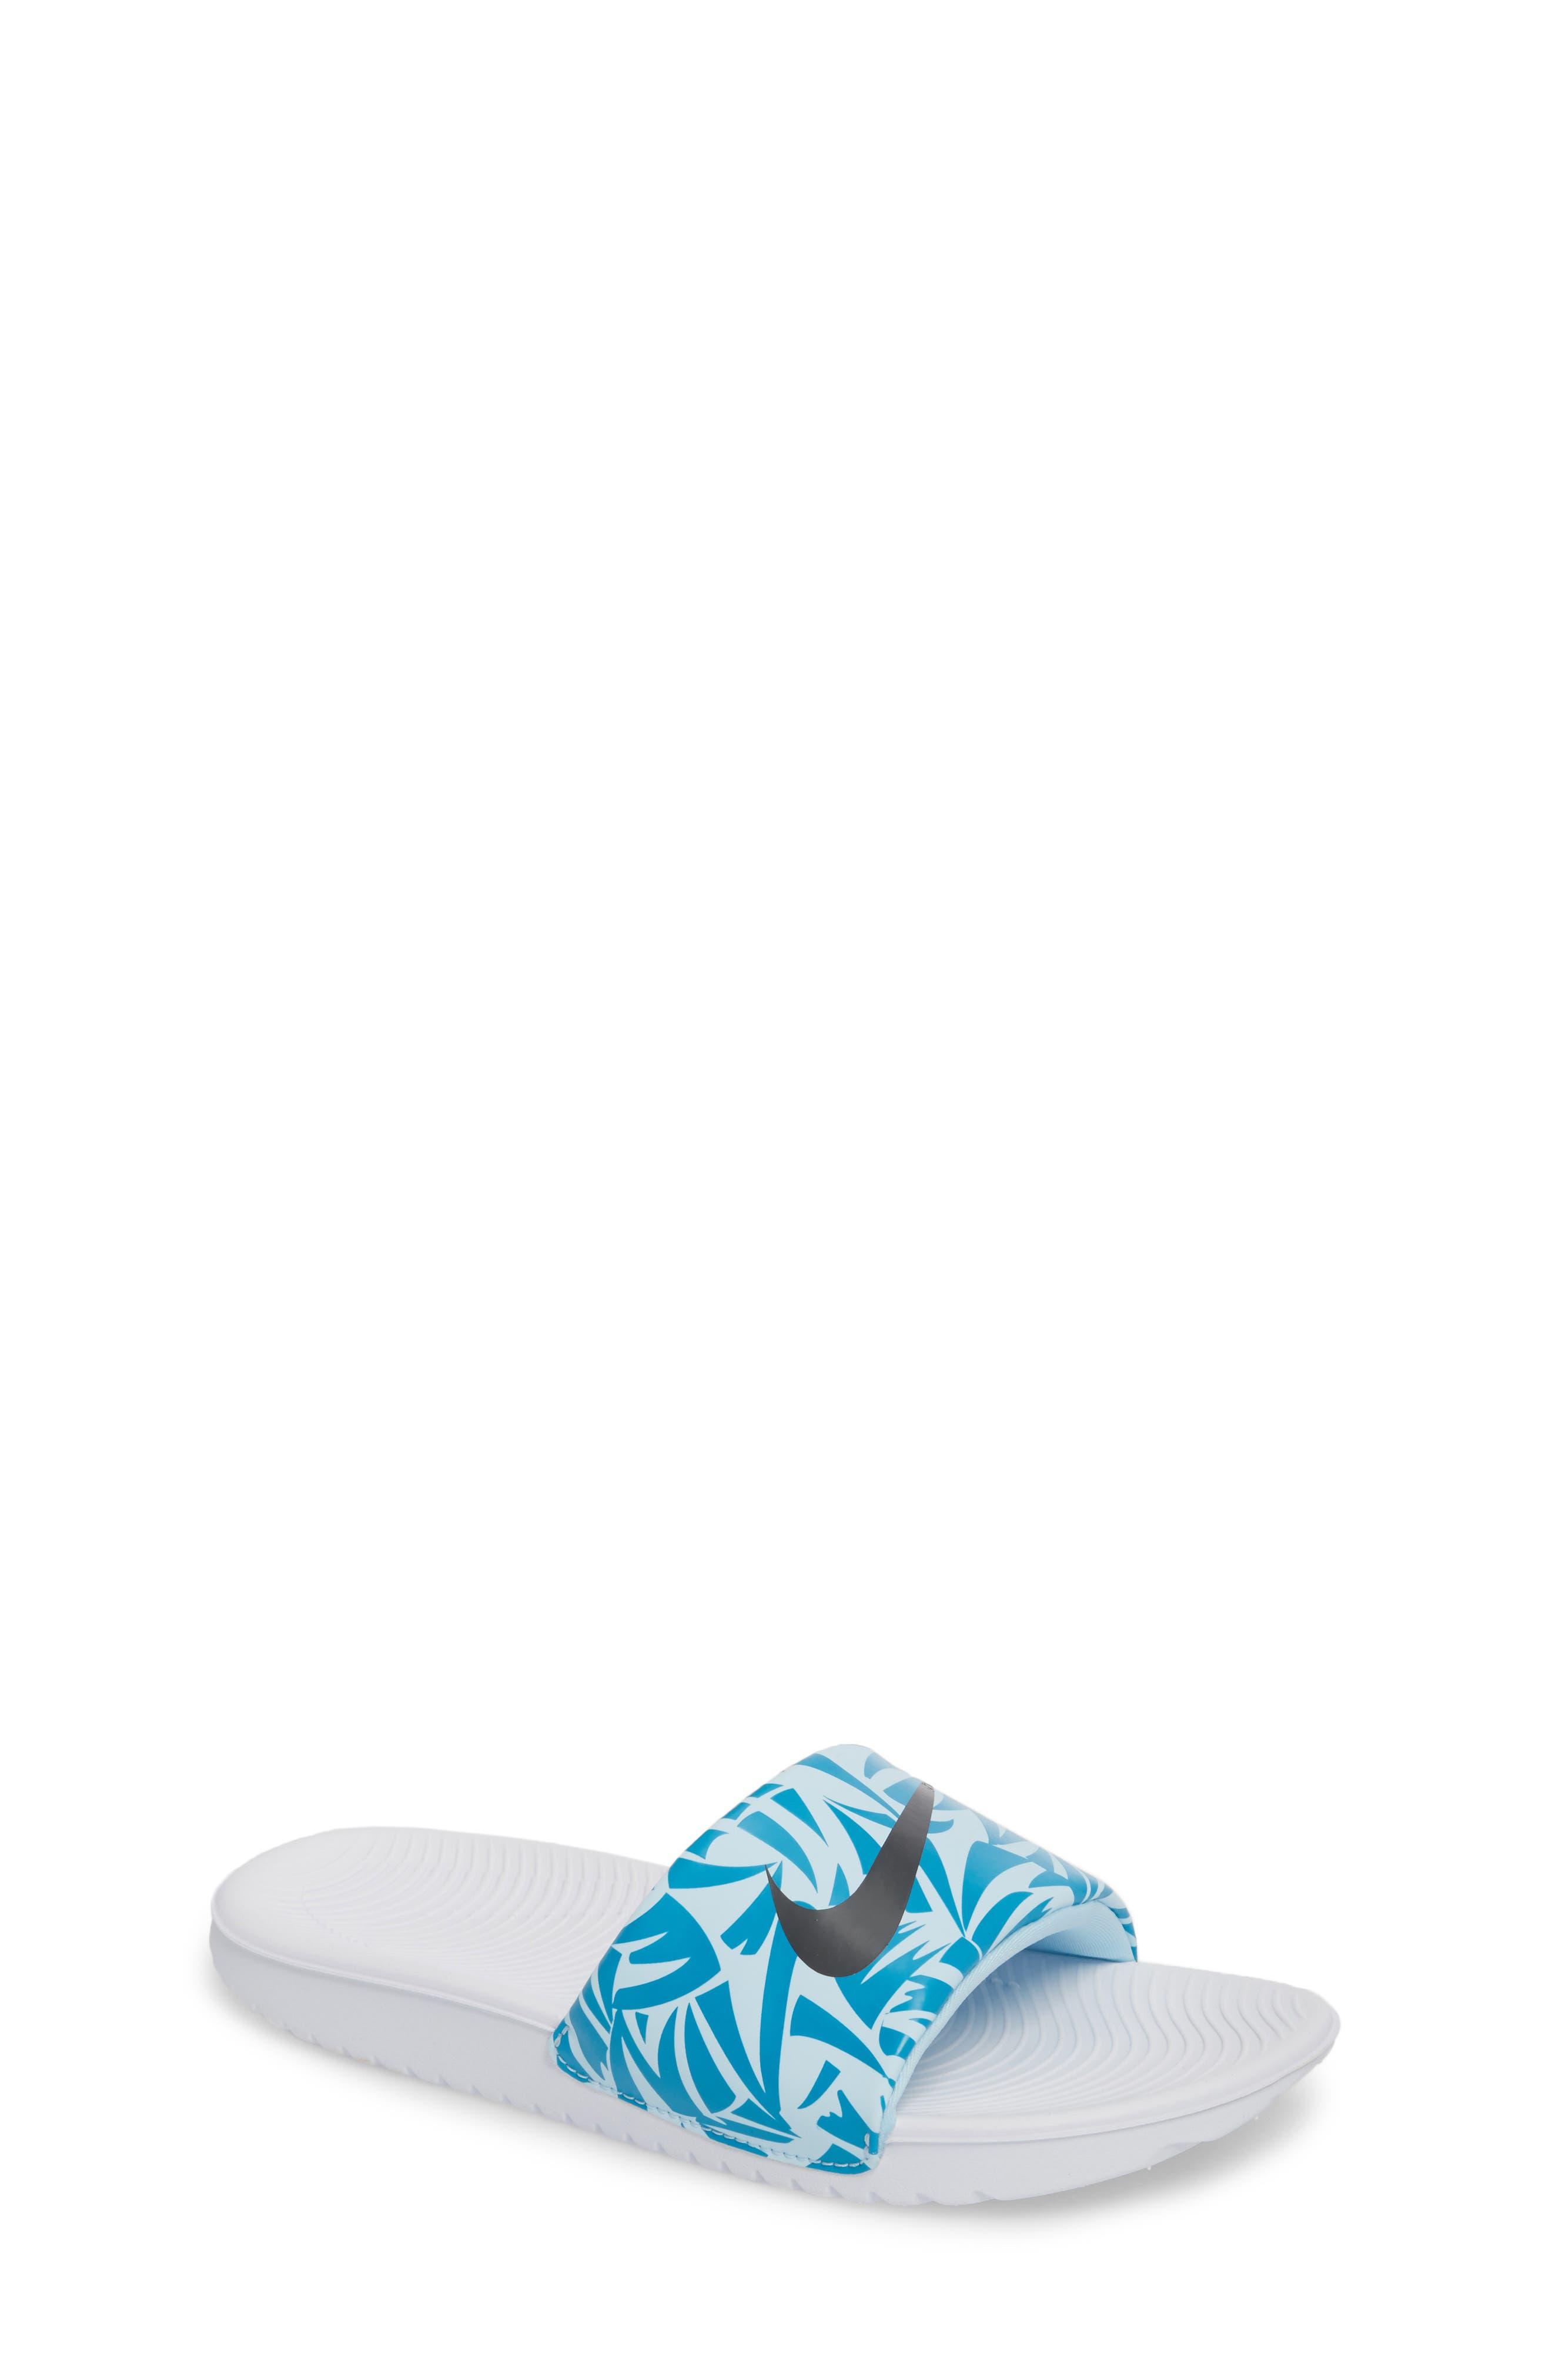 'Kawa' Print Slide Sandal,                             Main thumbnail 2, color,